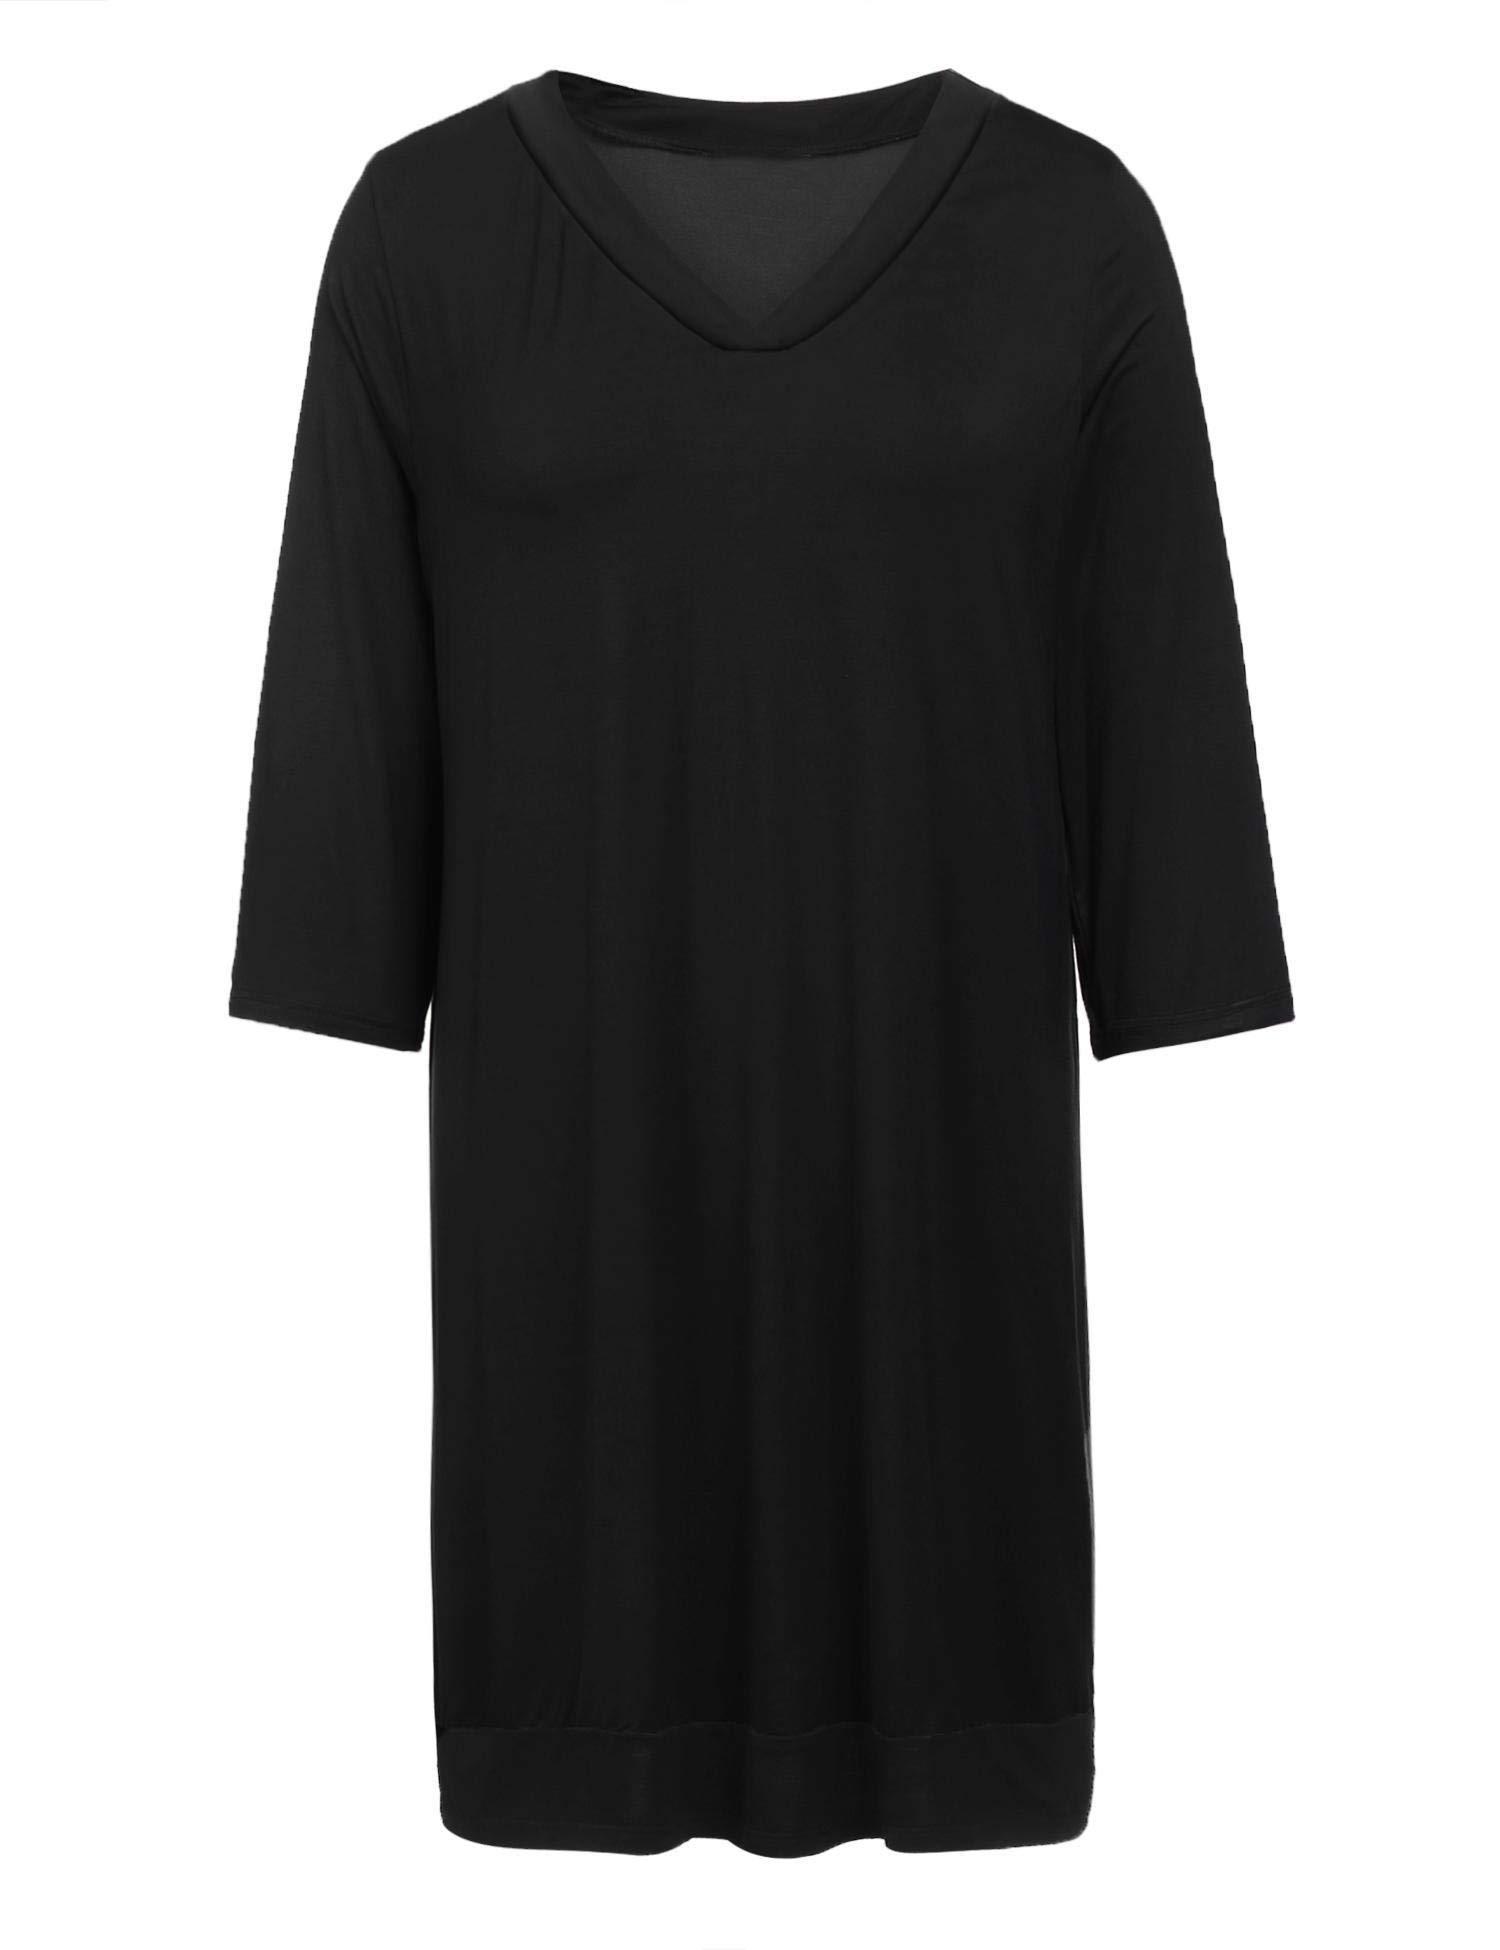 f01c2e3ae9 Langle Womens Pajama Dress Cotton Sleepwear Plus Size Solid Nightshirt  (Black